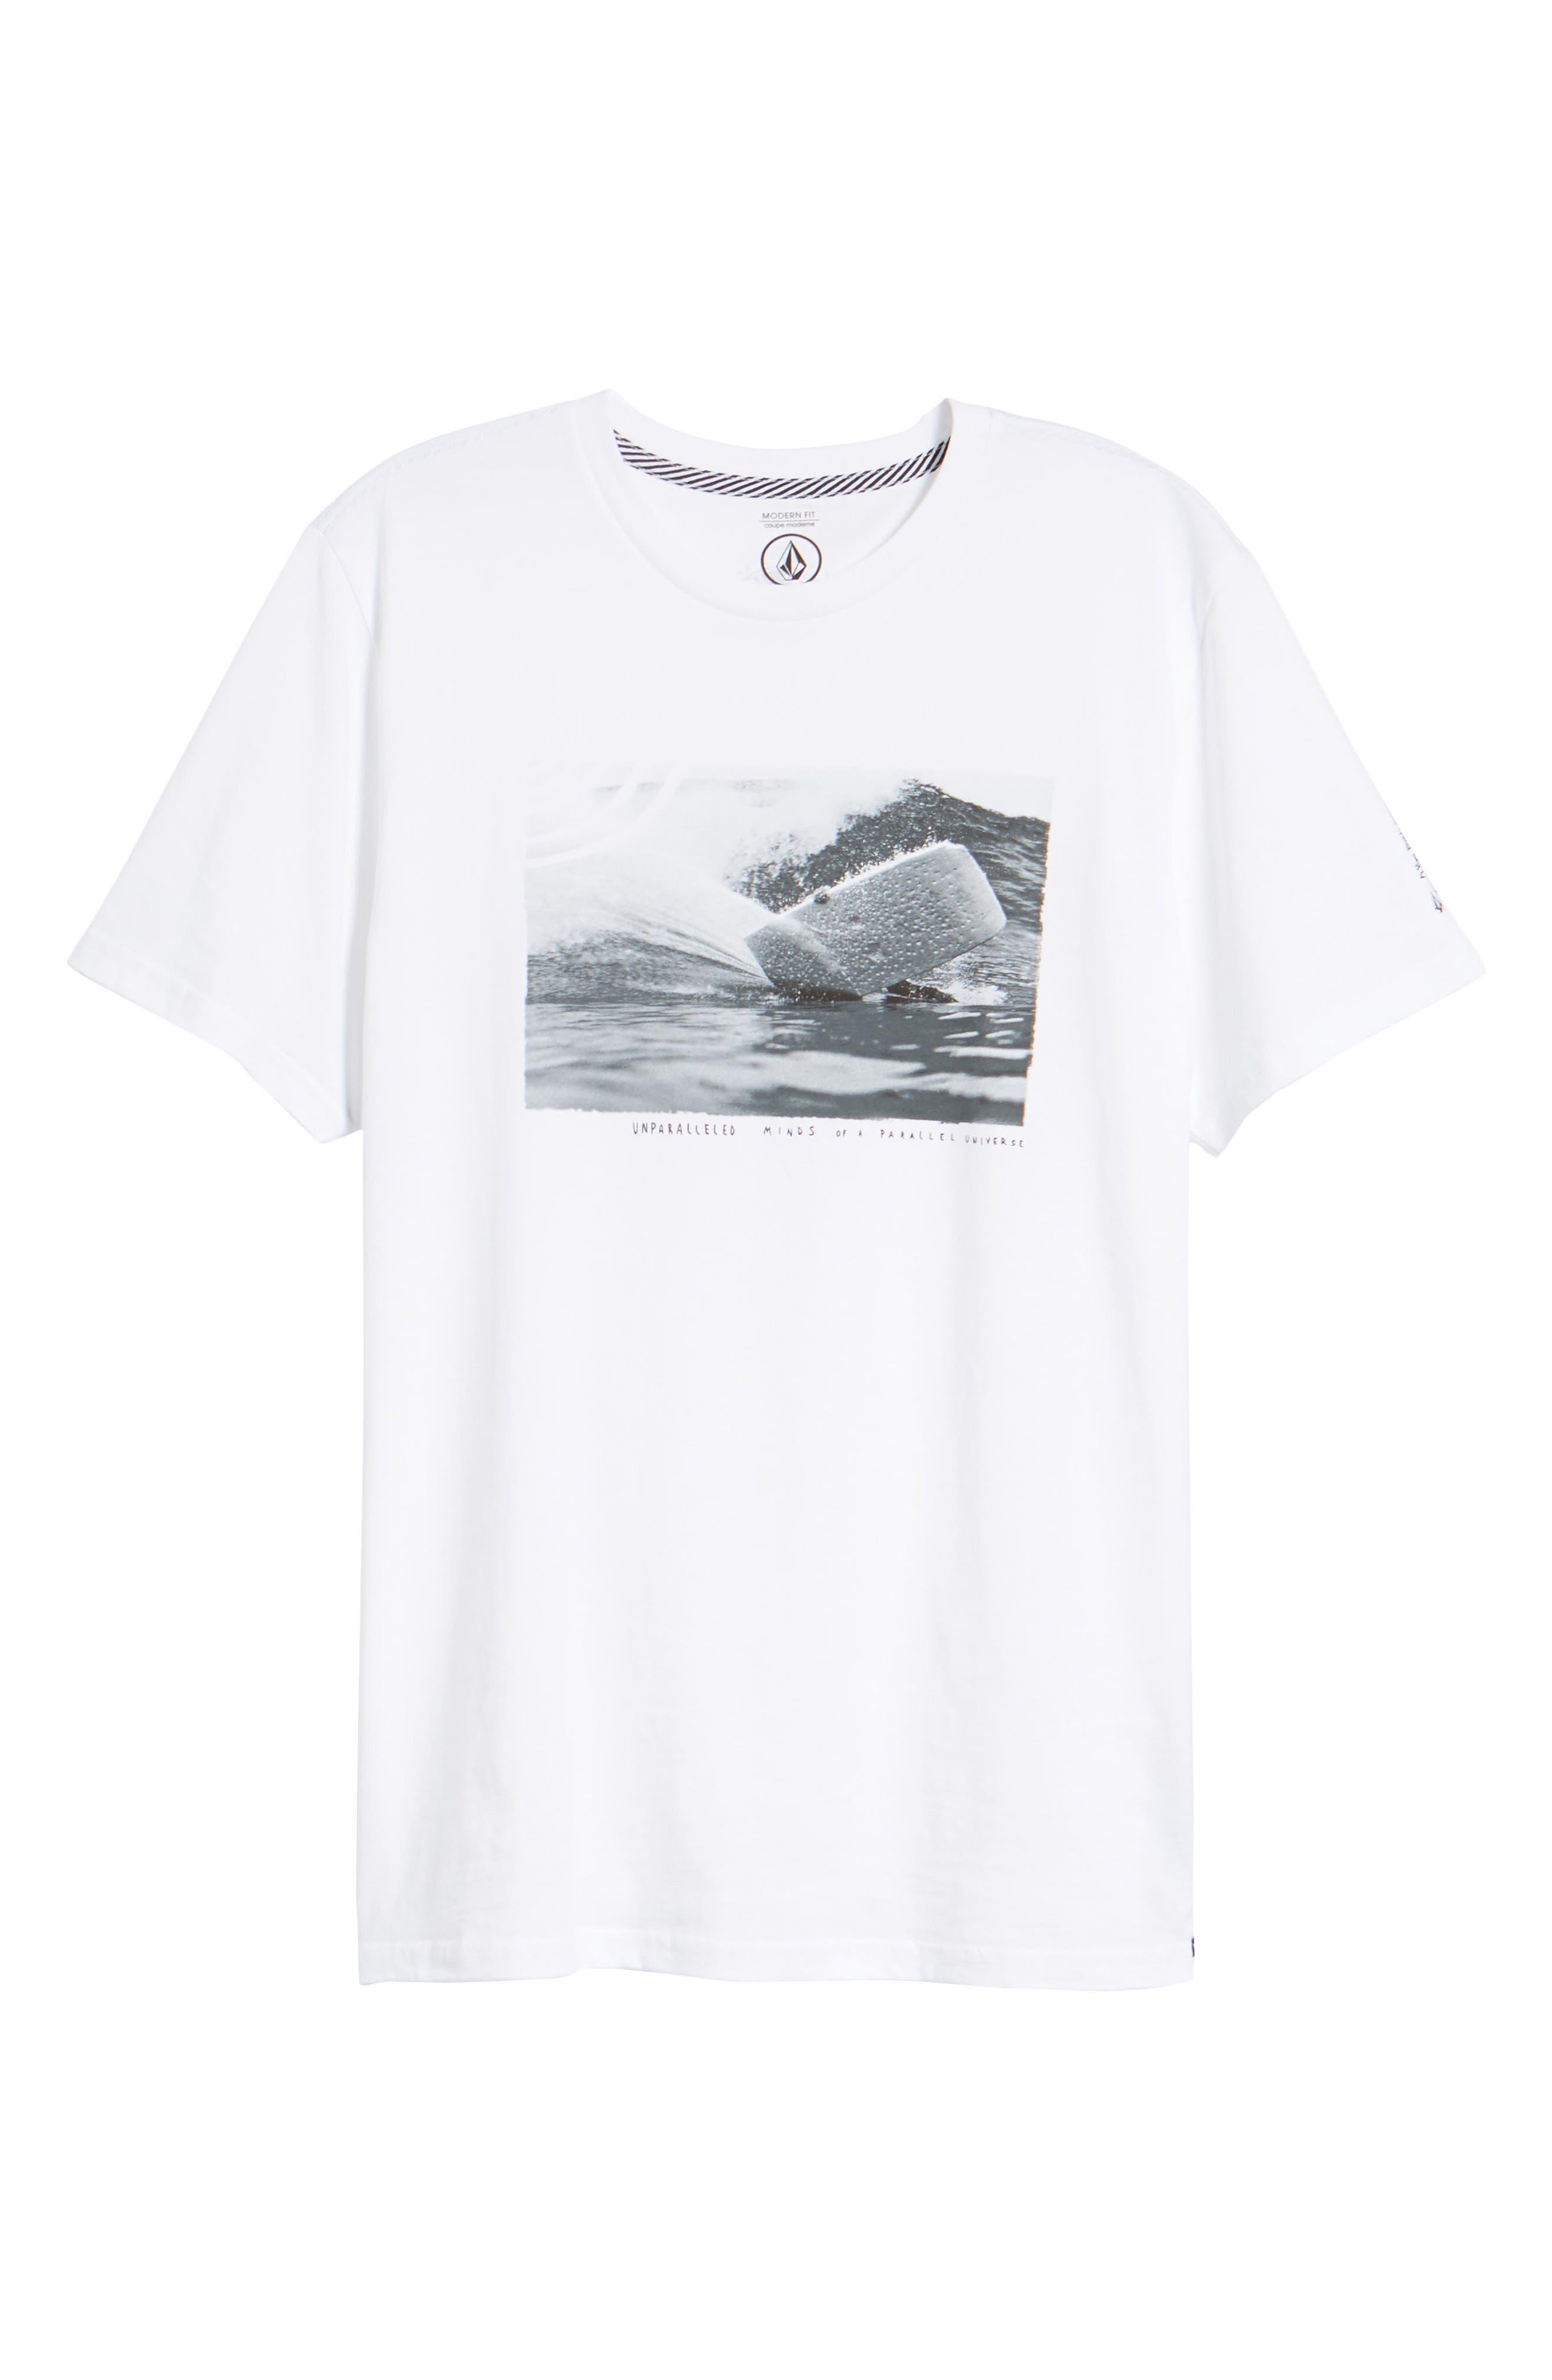 Burch Foam Graphic T-Shirt,                             Alternate thumbnail 6, color,                             100